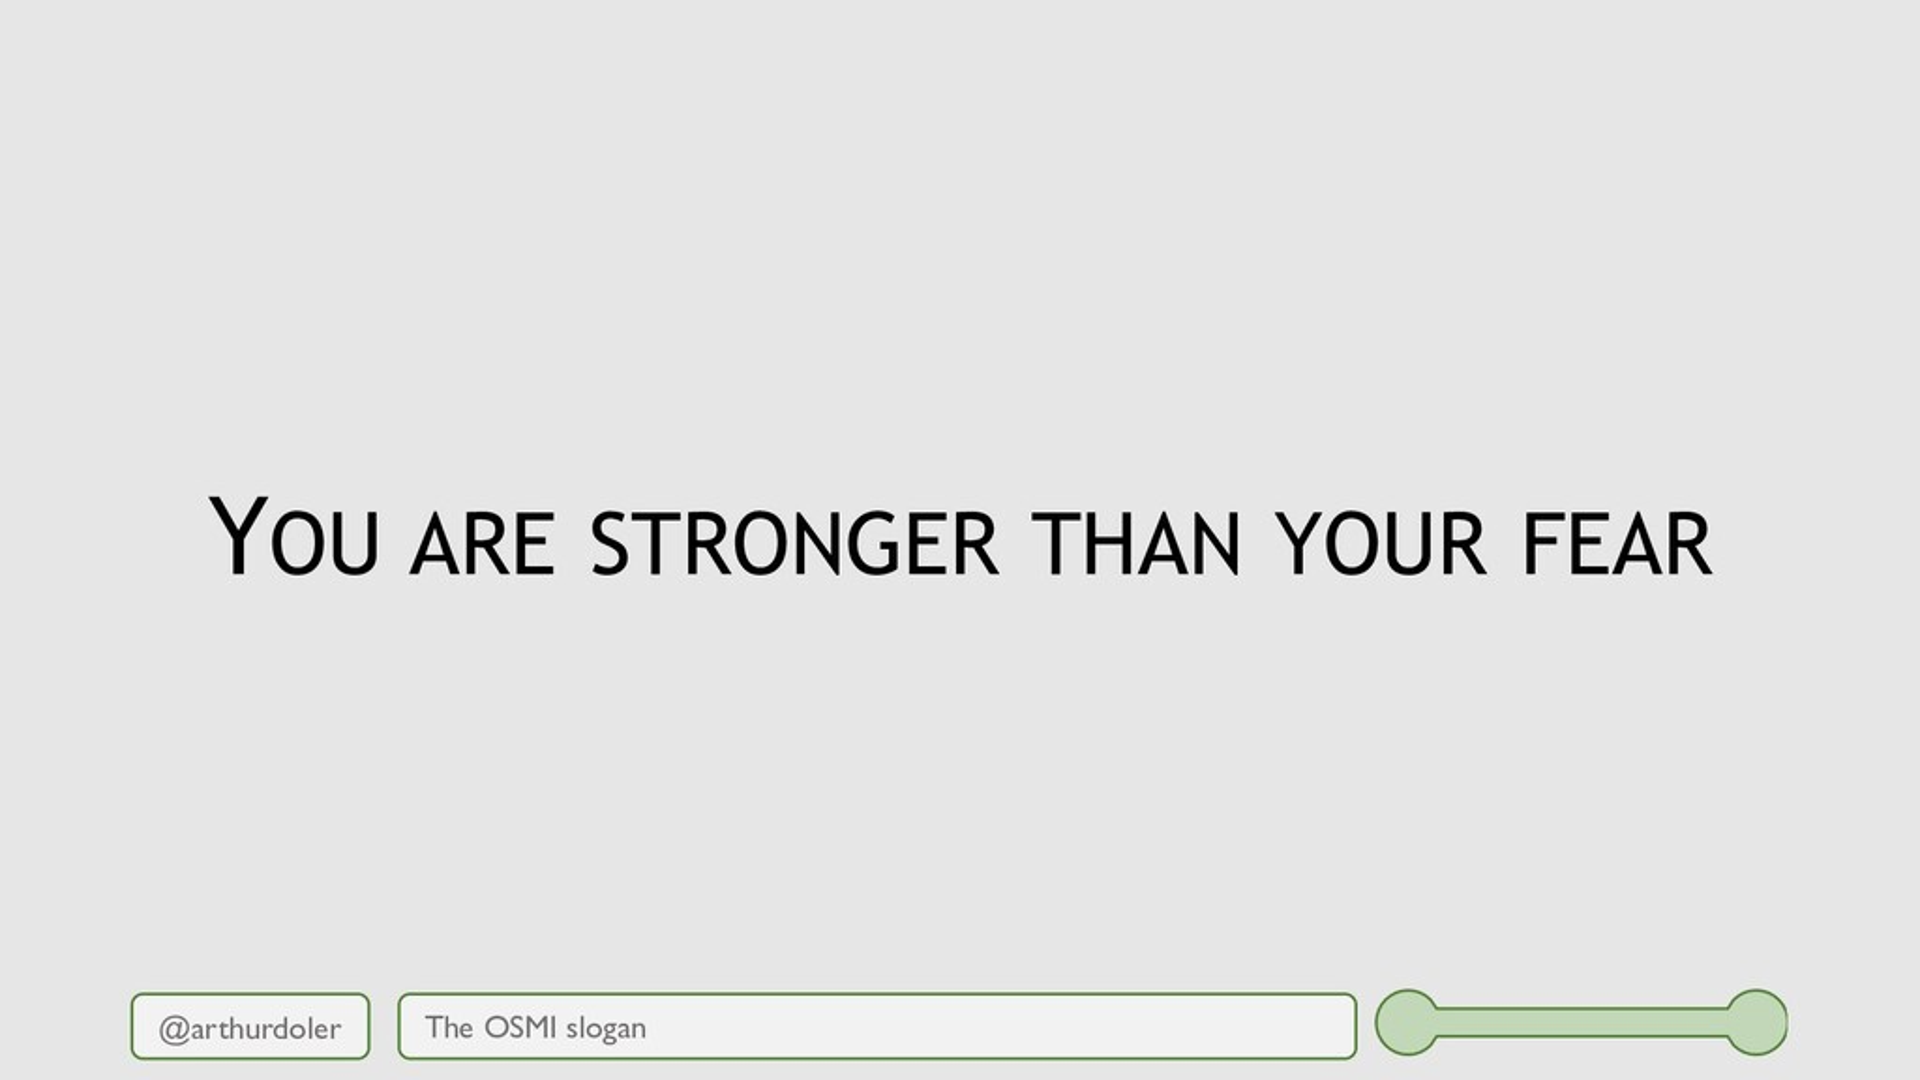 @arthurdoler YOU ARE STRONGER THAN YOUR FEAR Th...